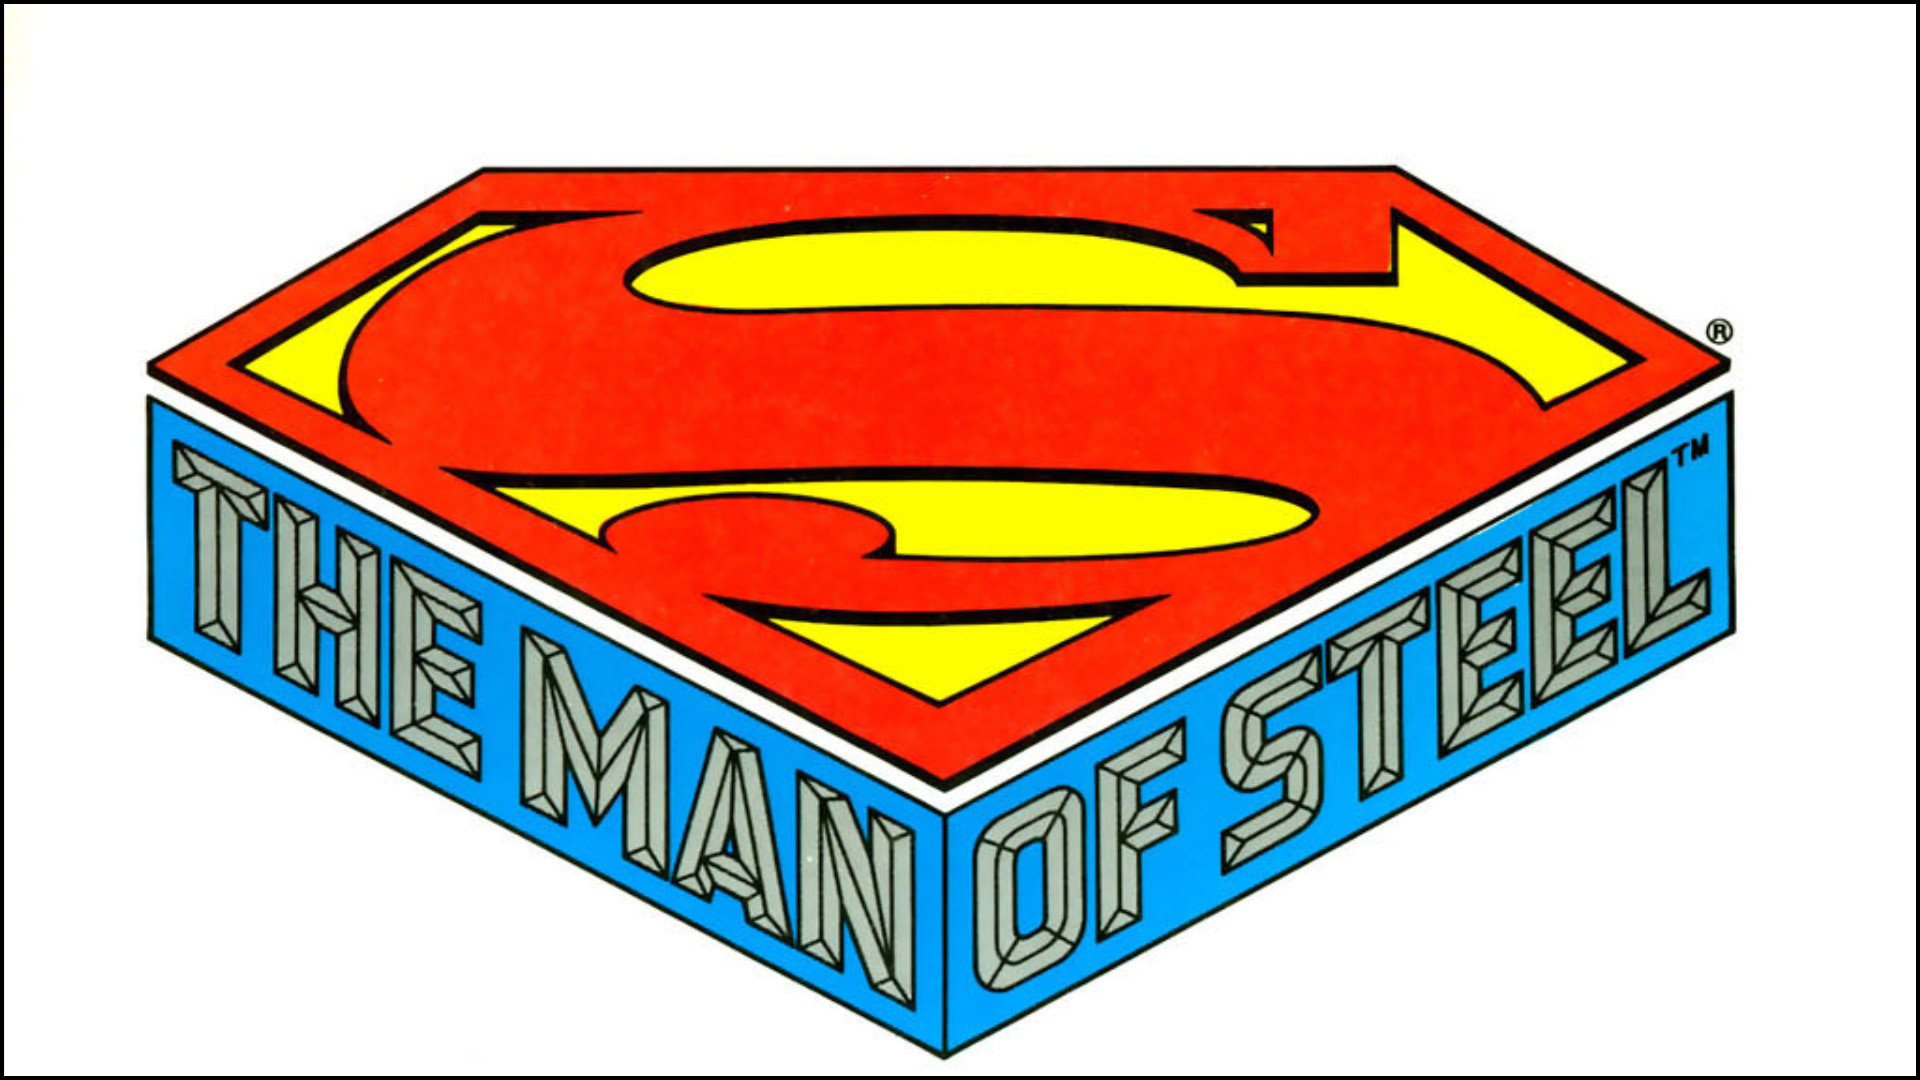 Superman logo wallpapers hd for desktop backgrounds awesome superman logo free wallpaper id456248 for full hd desktop 1920x1080 voltagebd Gallery